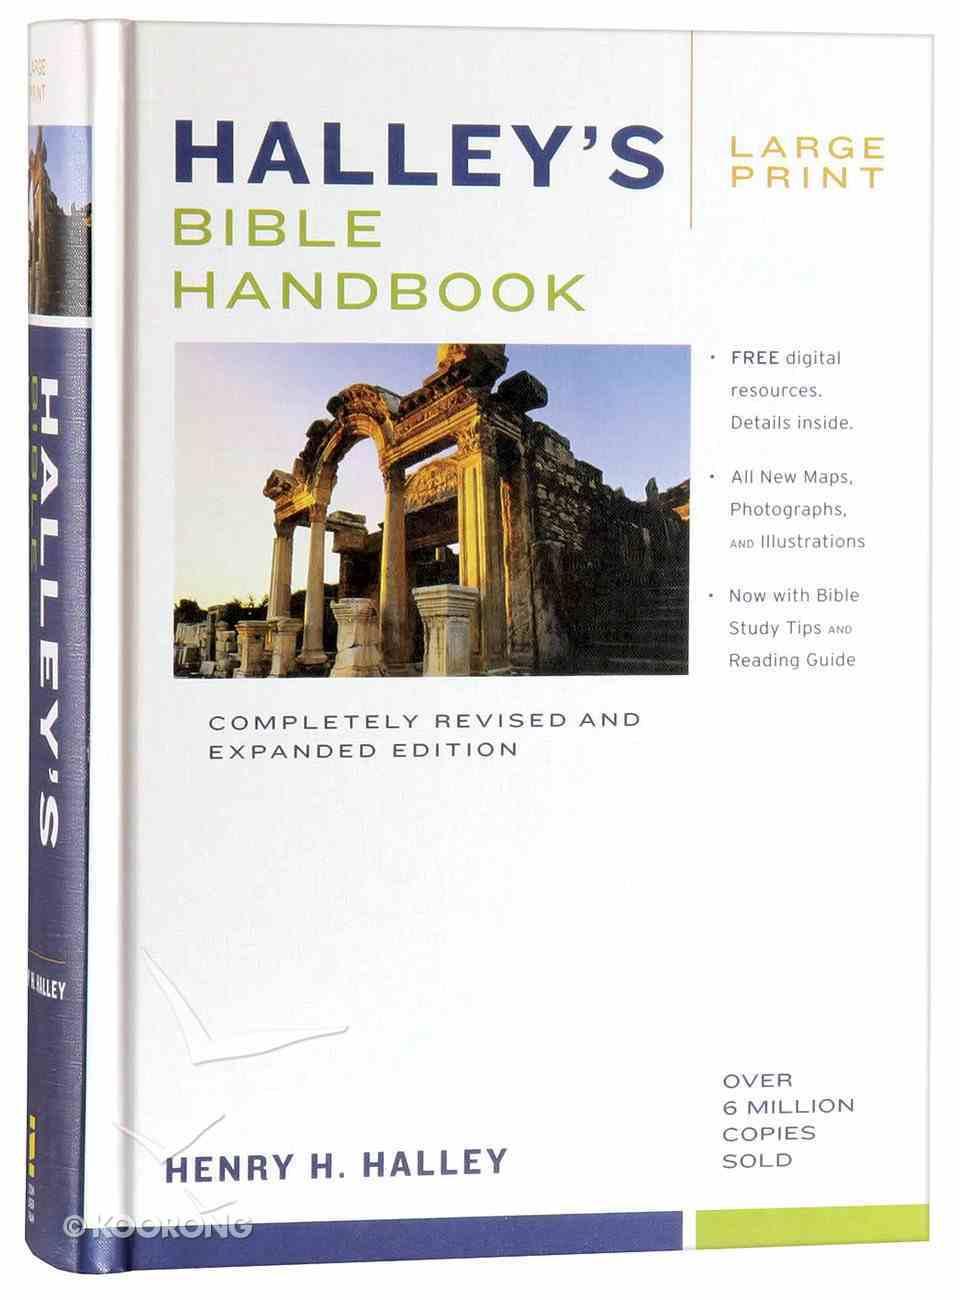 Halley's Bible Handbook (Large Print) Hardback